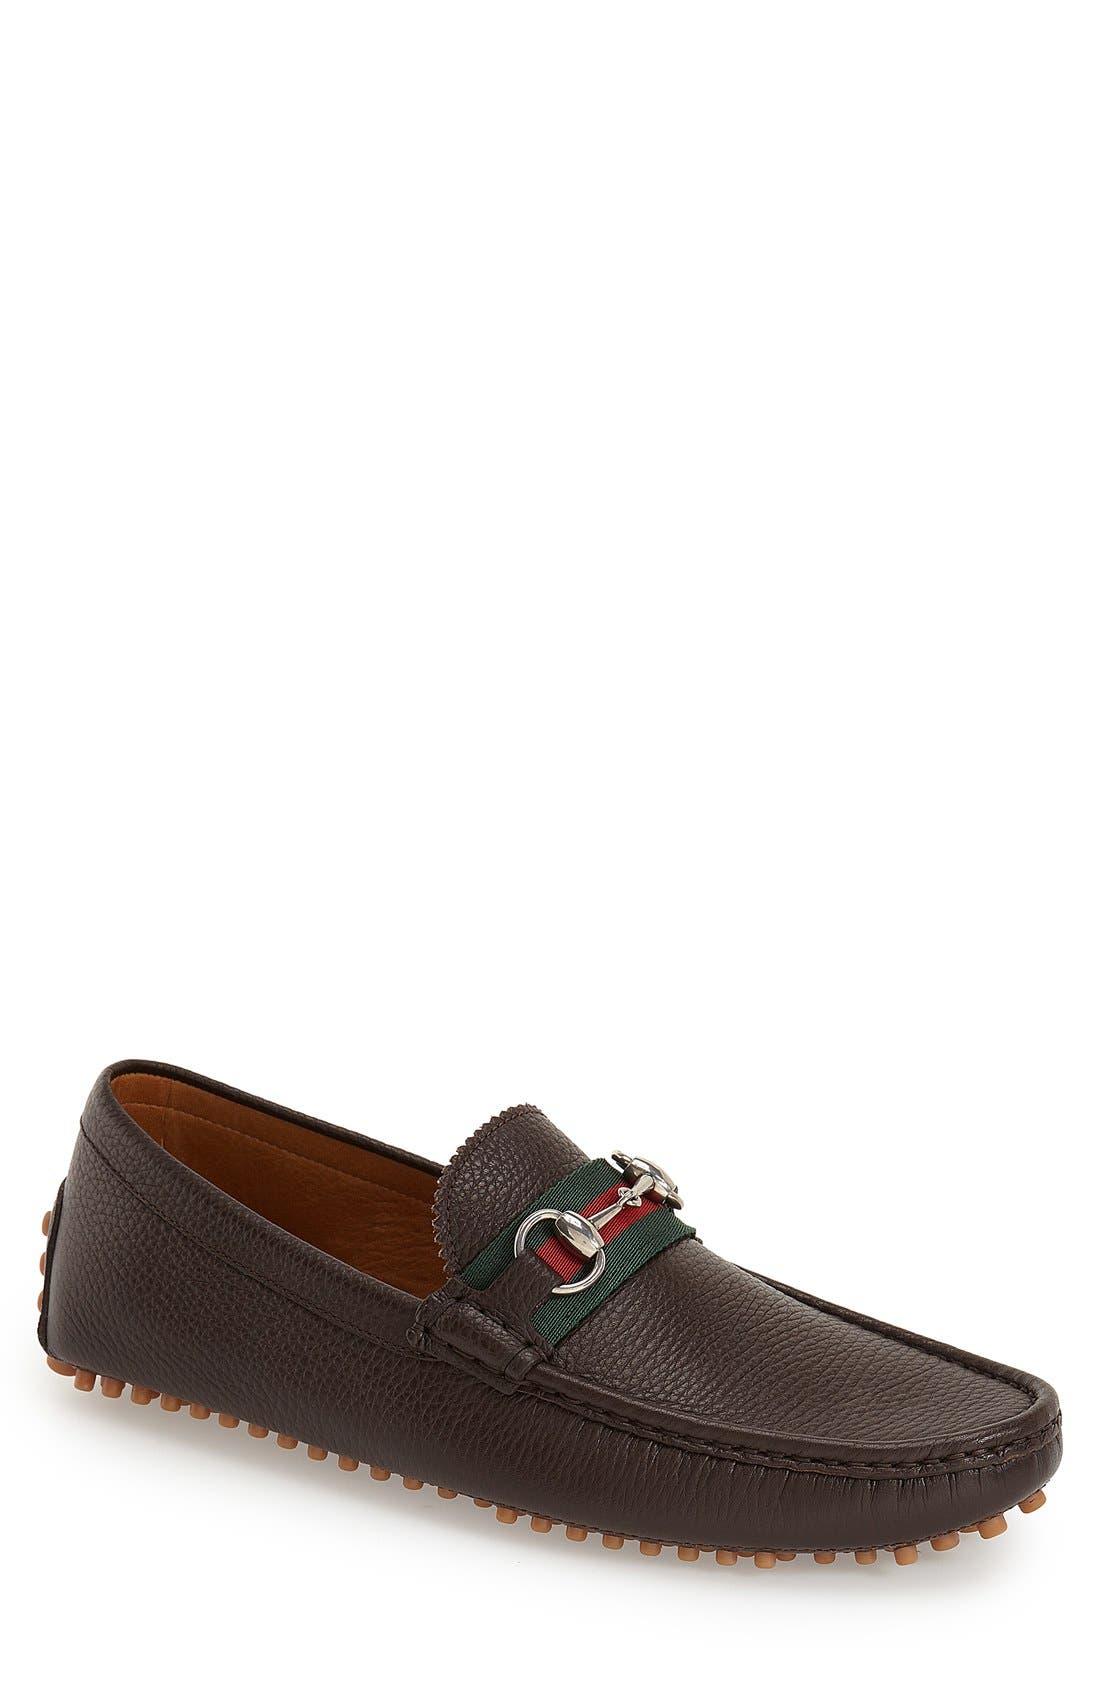 Men S Drivers Shoes Nordstrom